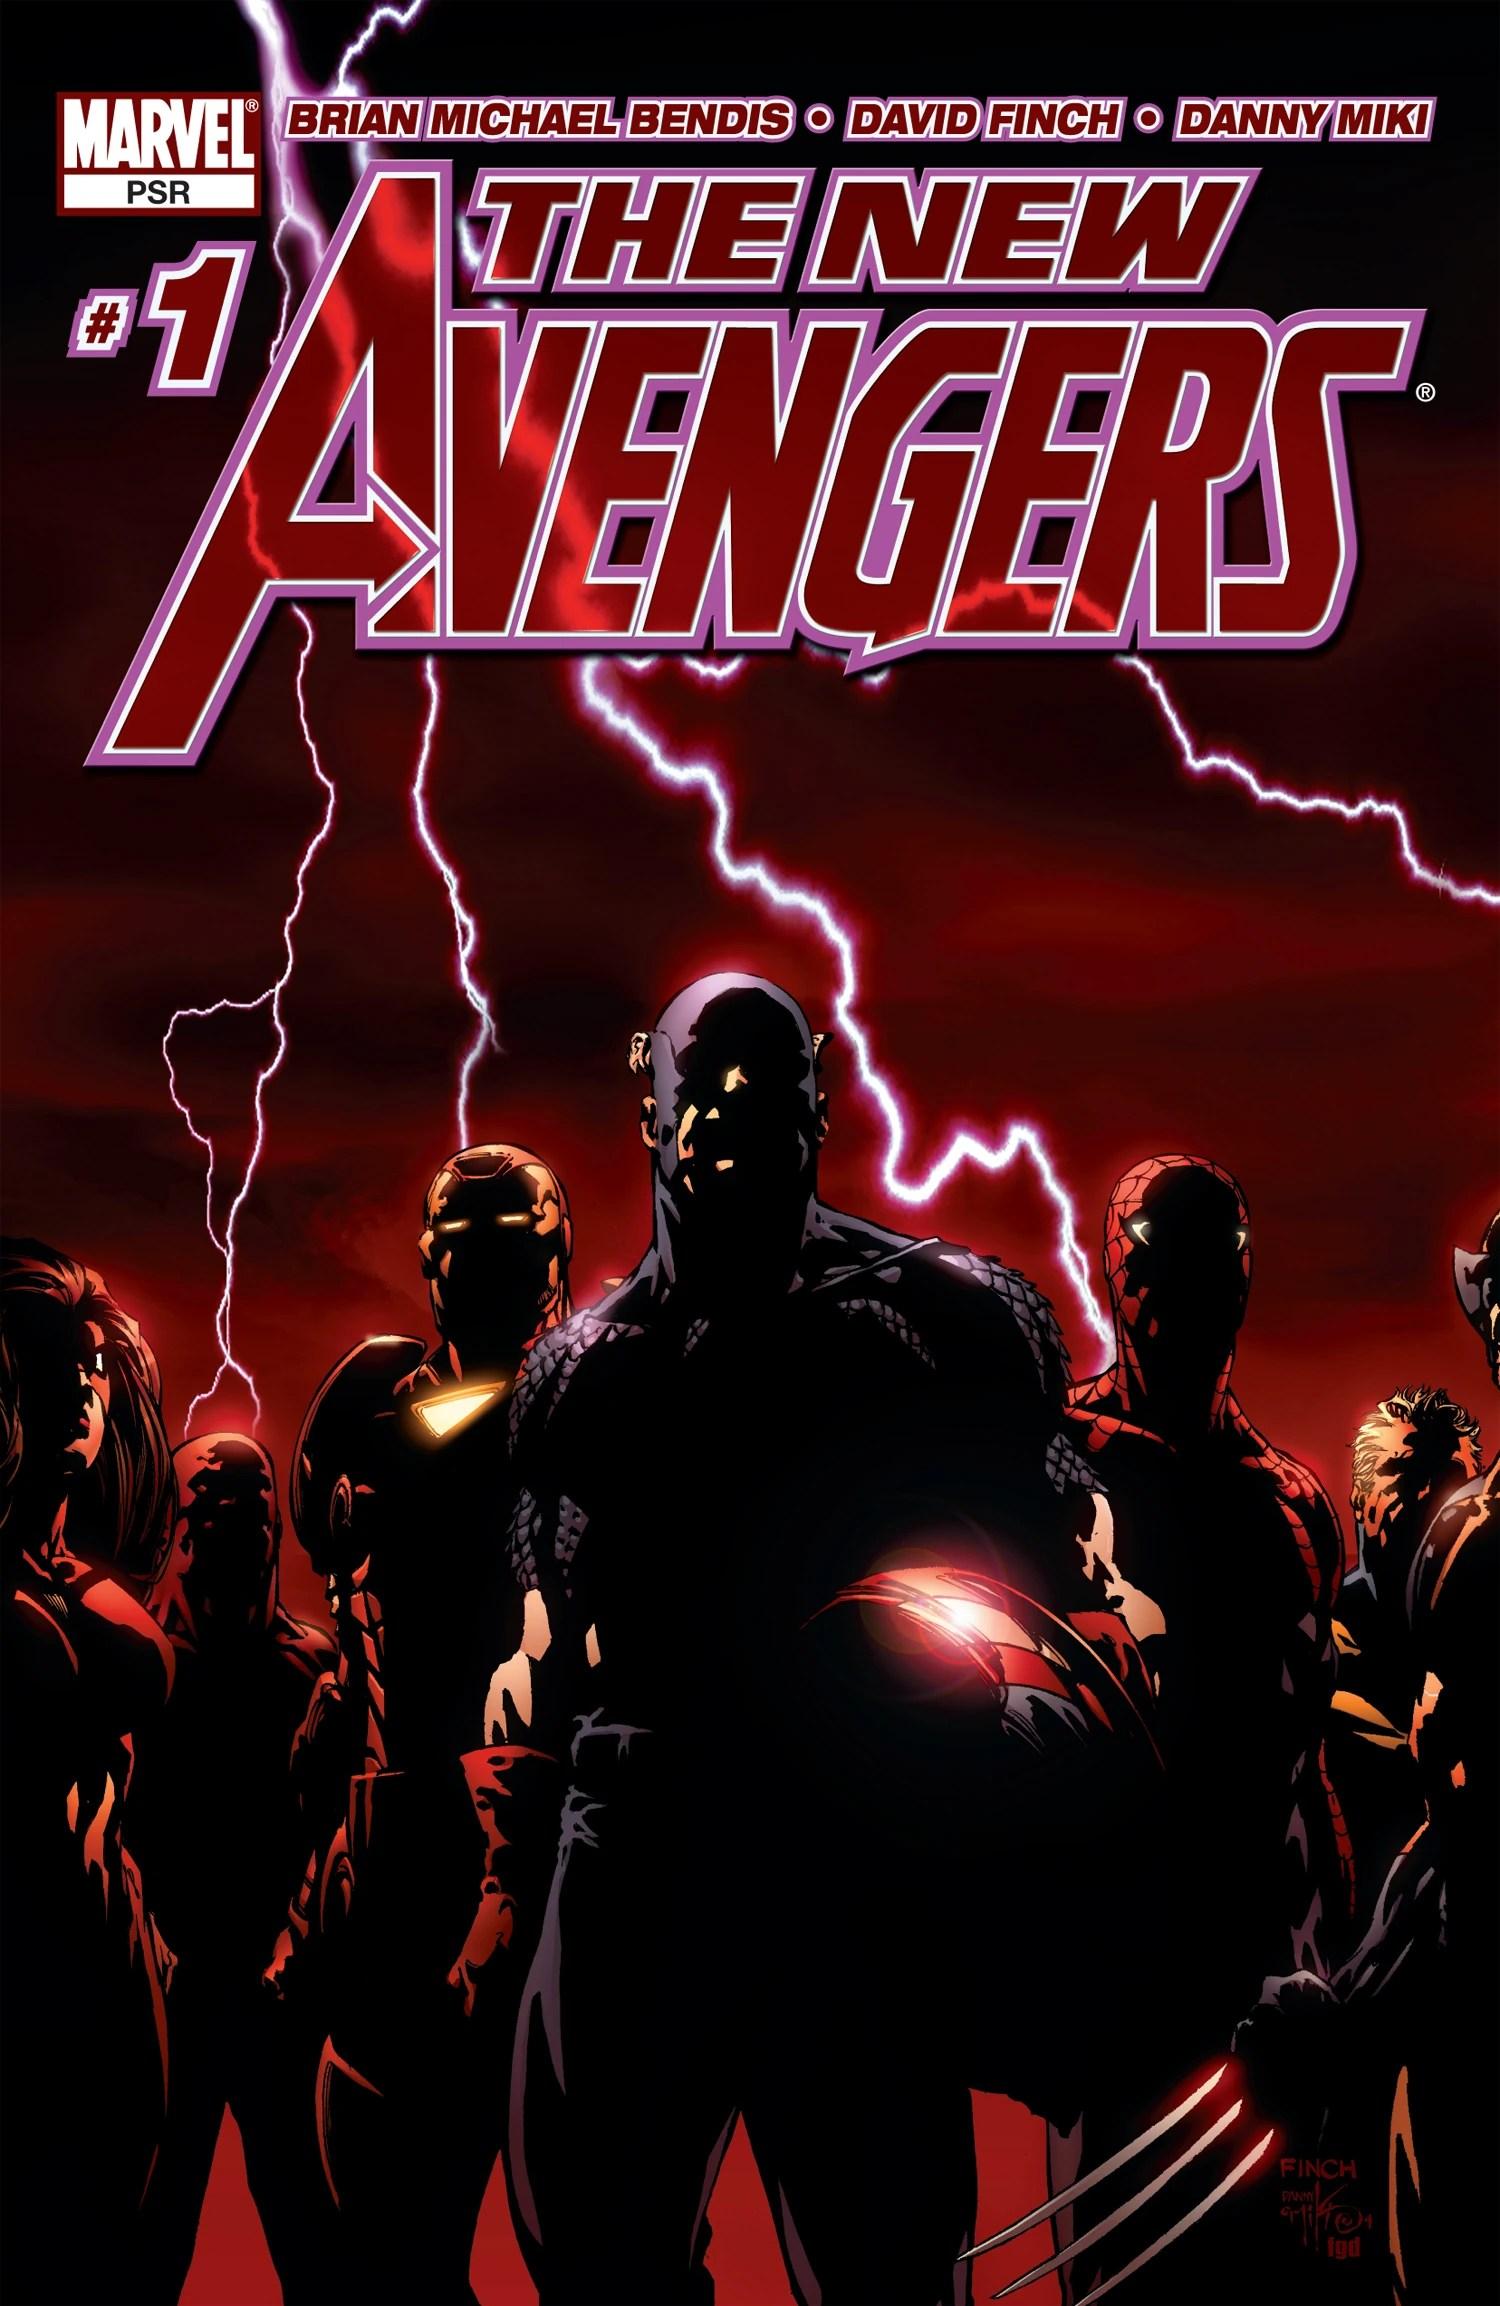 https://i0.wp.com/img3.wikia.nocookie.net/__cb20060507194607/marveldatabase/images/c/c8/New_Avengers_Vol_1_1.jpg